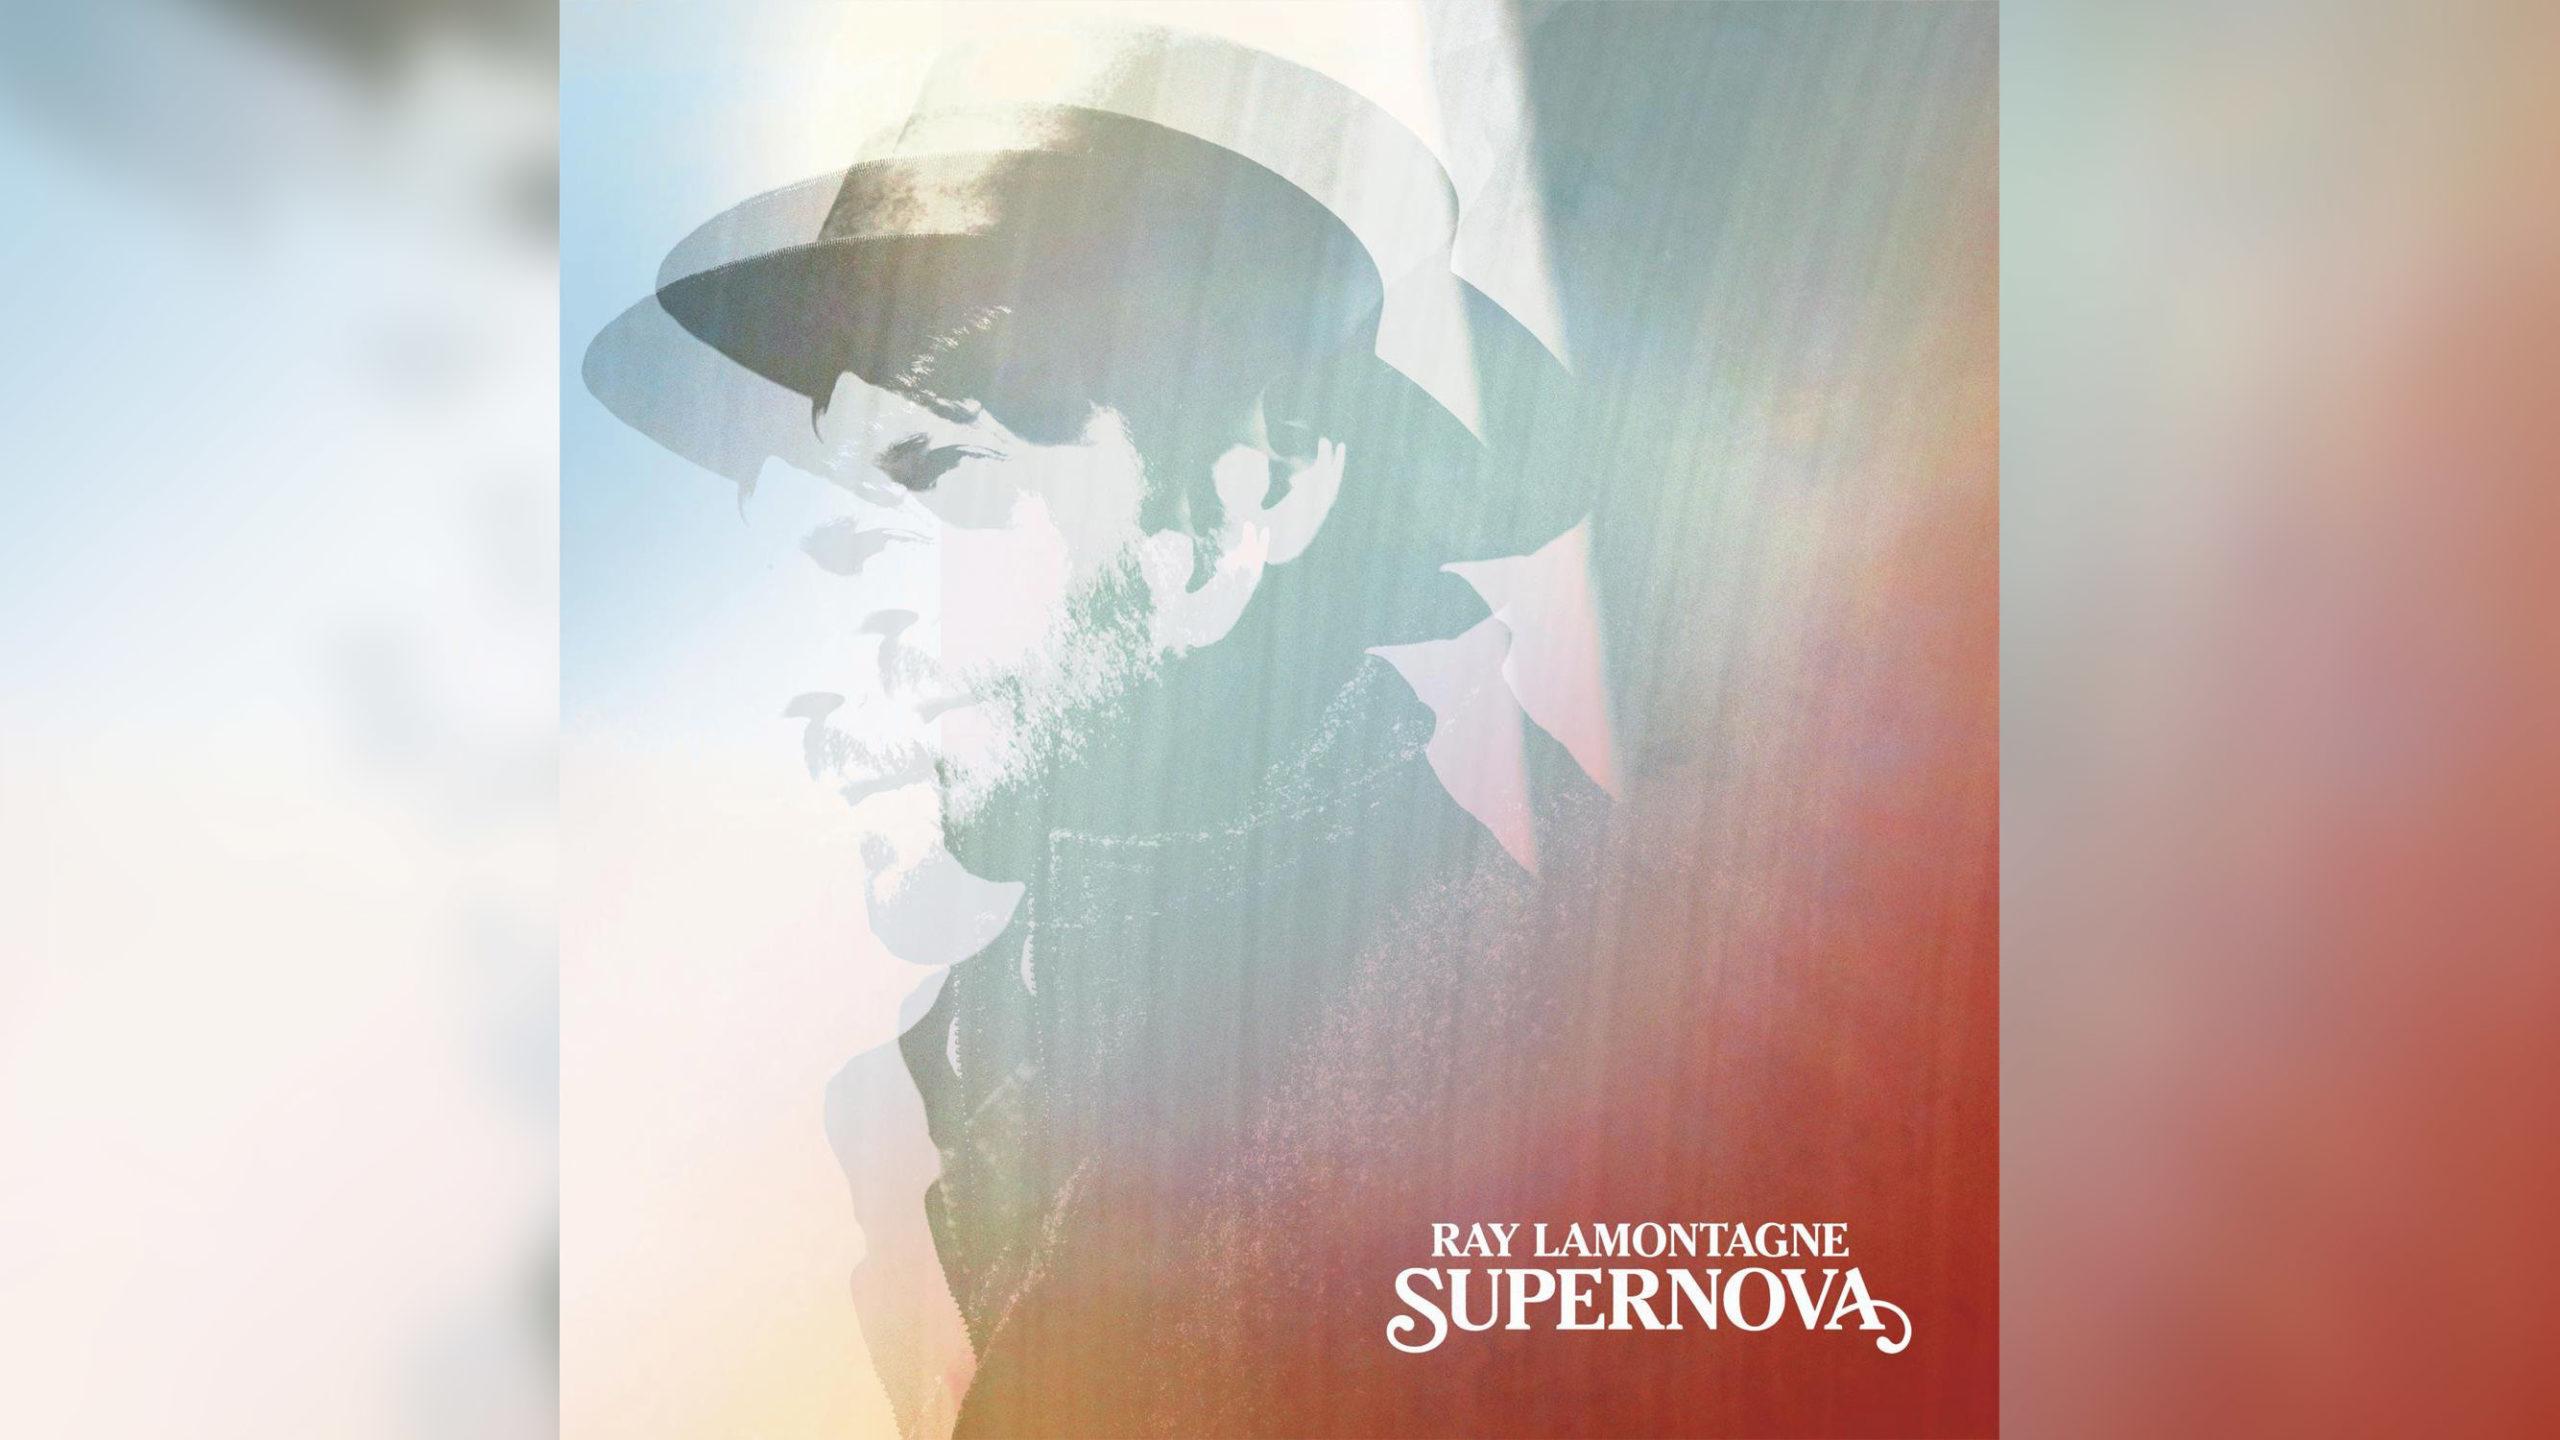 Ray Lamontagne's Supernova album cover